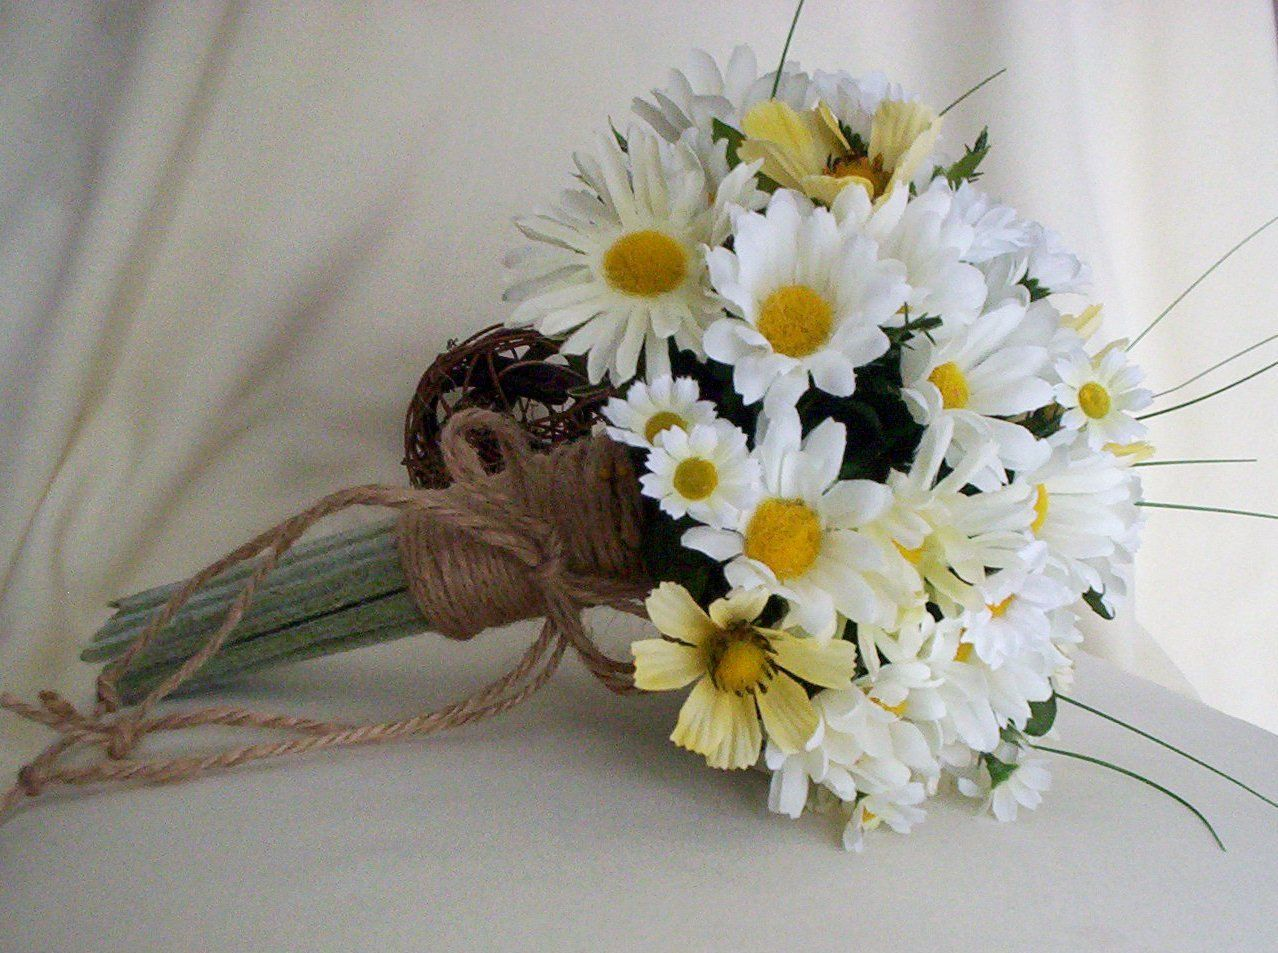 Daisy bouquet twine wrap hippie bridal silk wedding flowers daisy bouquet twine wrap hippie bridal silk wedding flowers accessories faux daisy country bridesmaid bokay dhlflorist Gallery